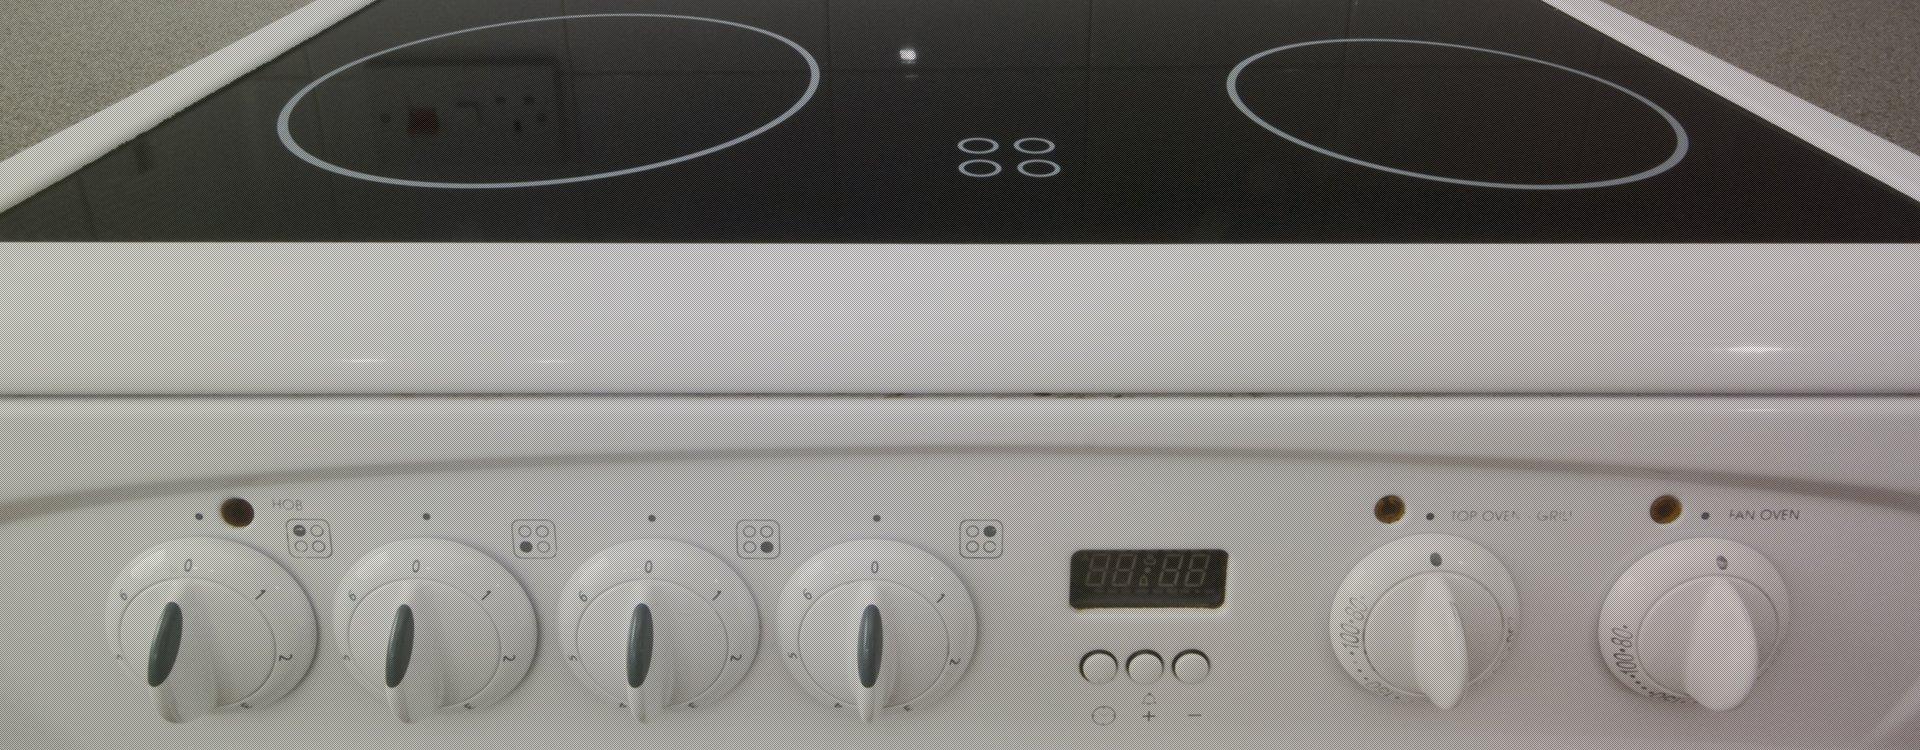 Uncategorized Kitchen Appliance Repair Parts appliance engineers at advanced domestic services ltd kitchen ltd